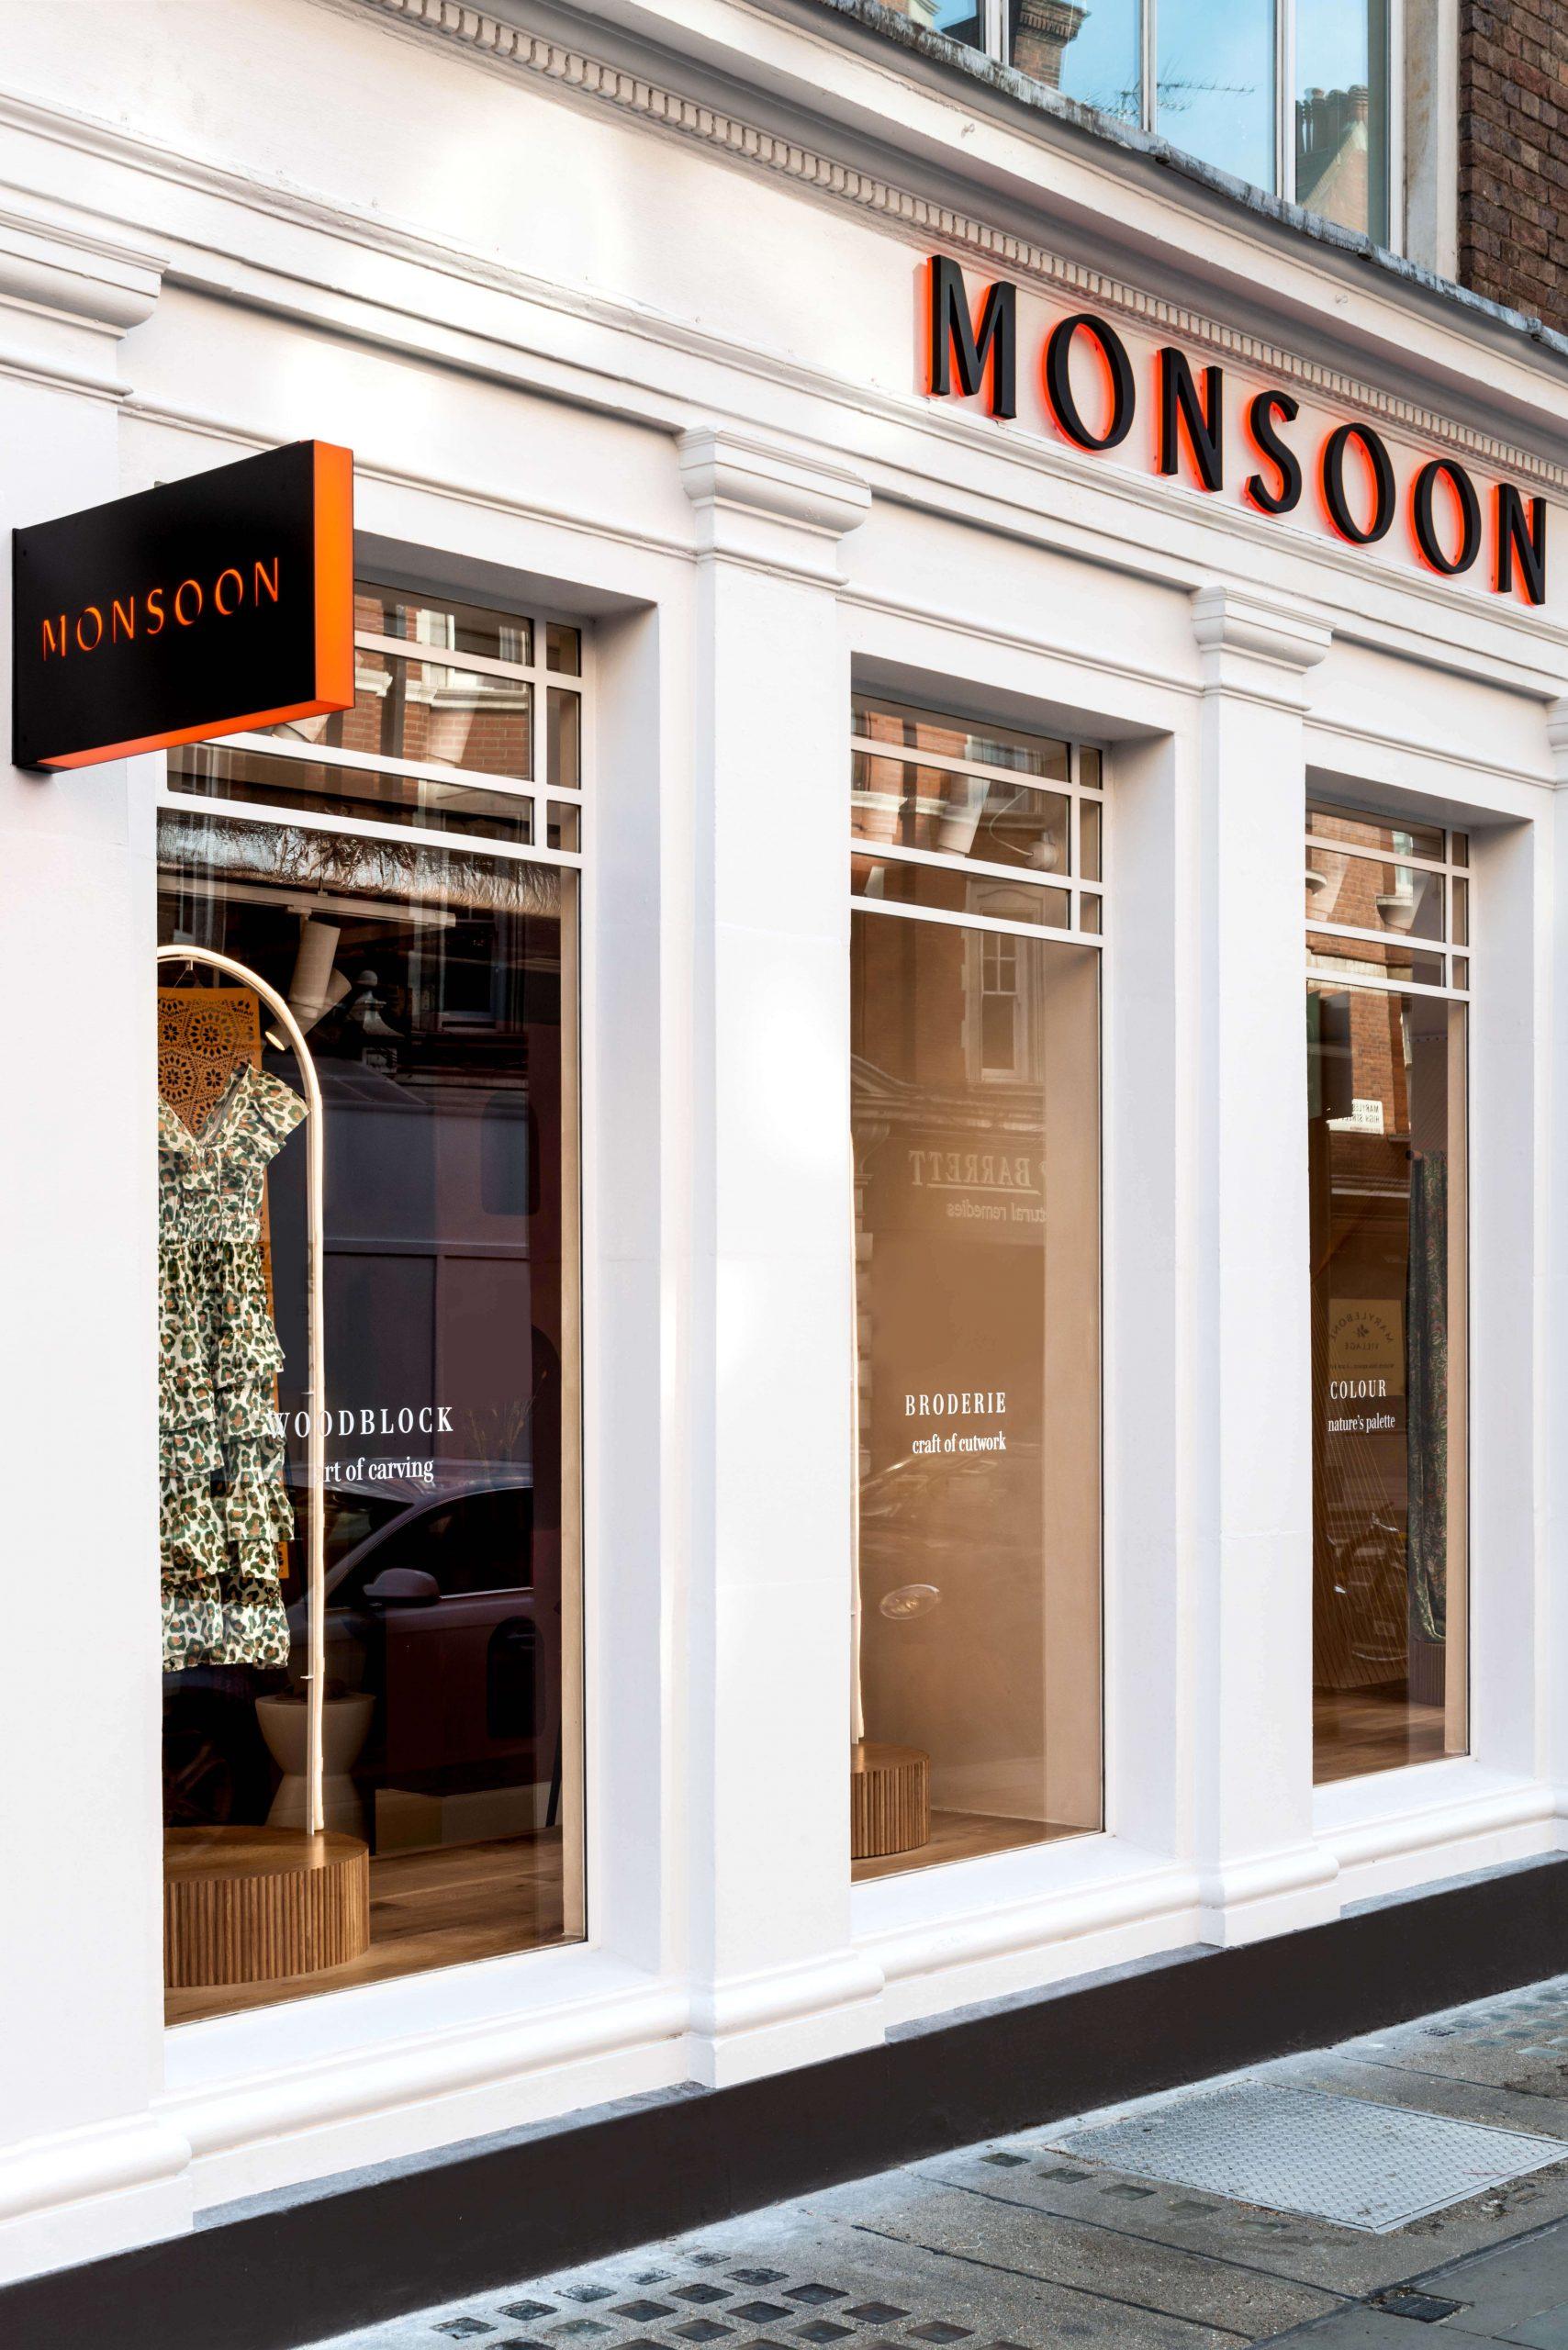 Monsoon shop exterior